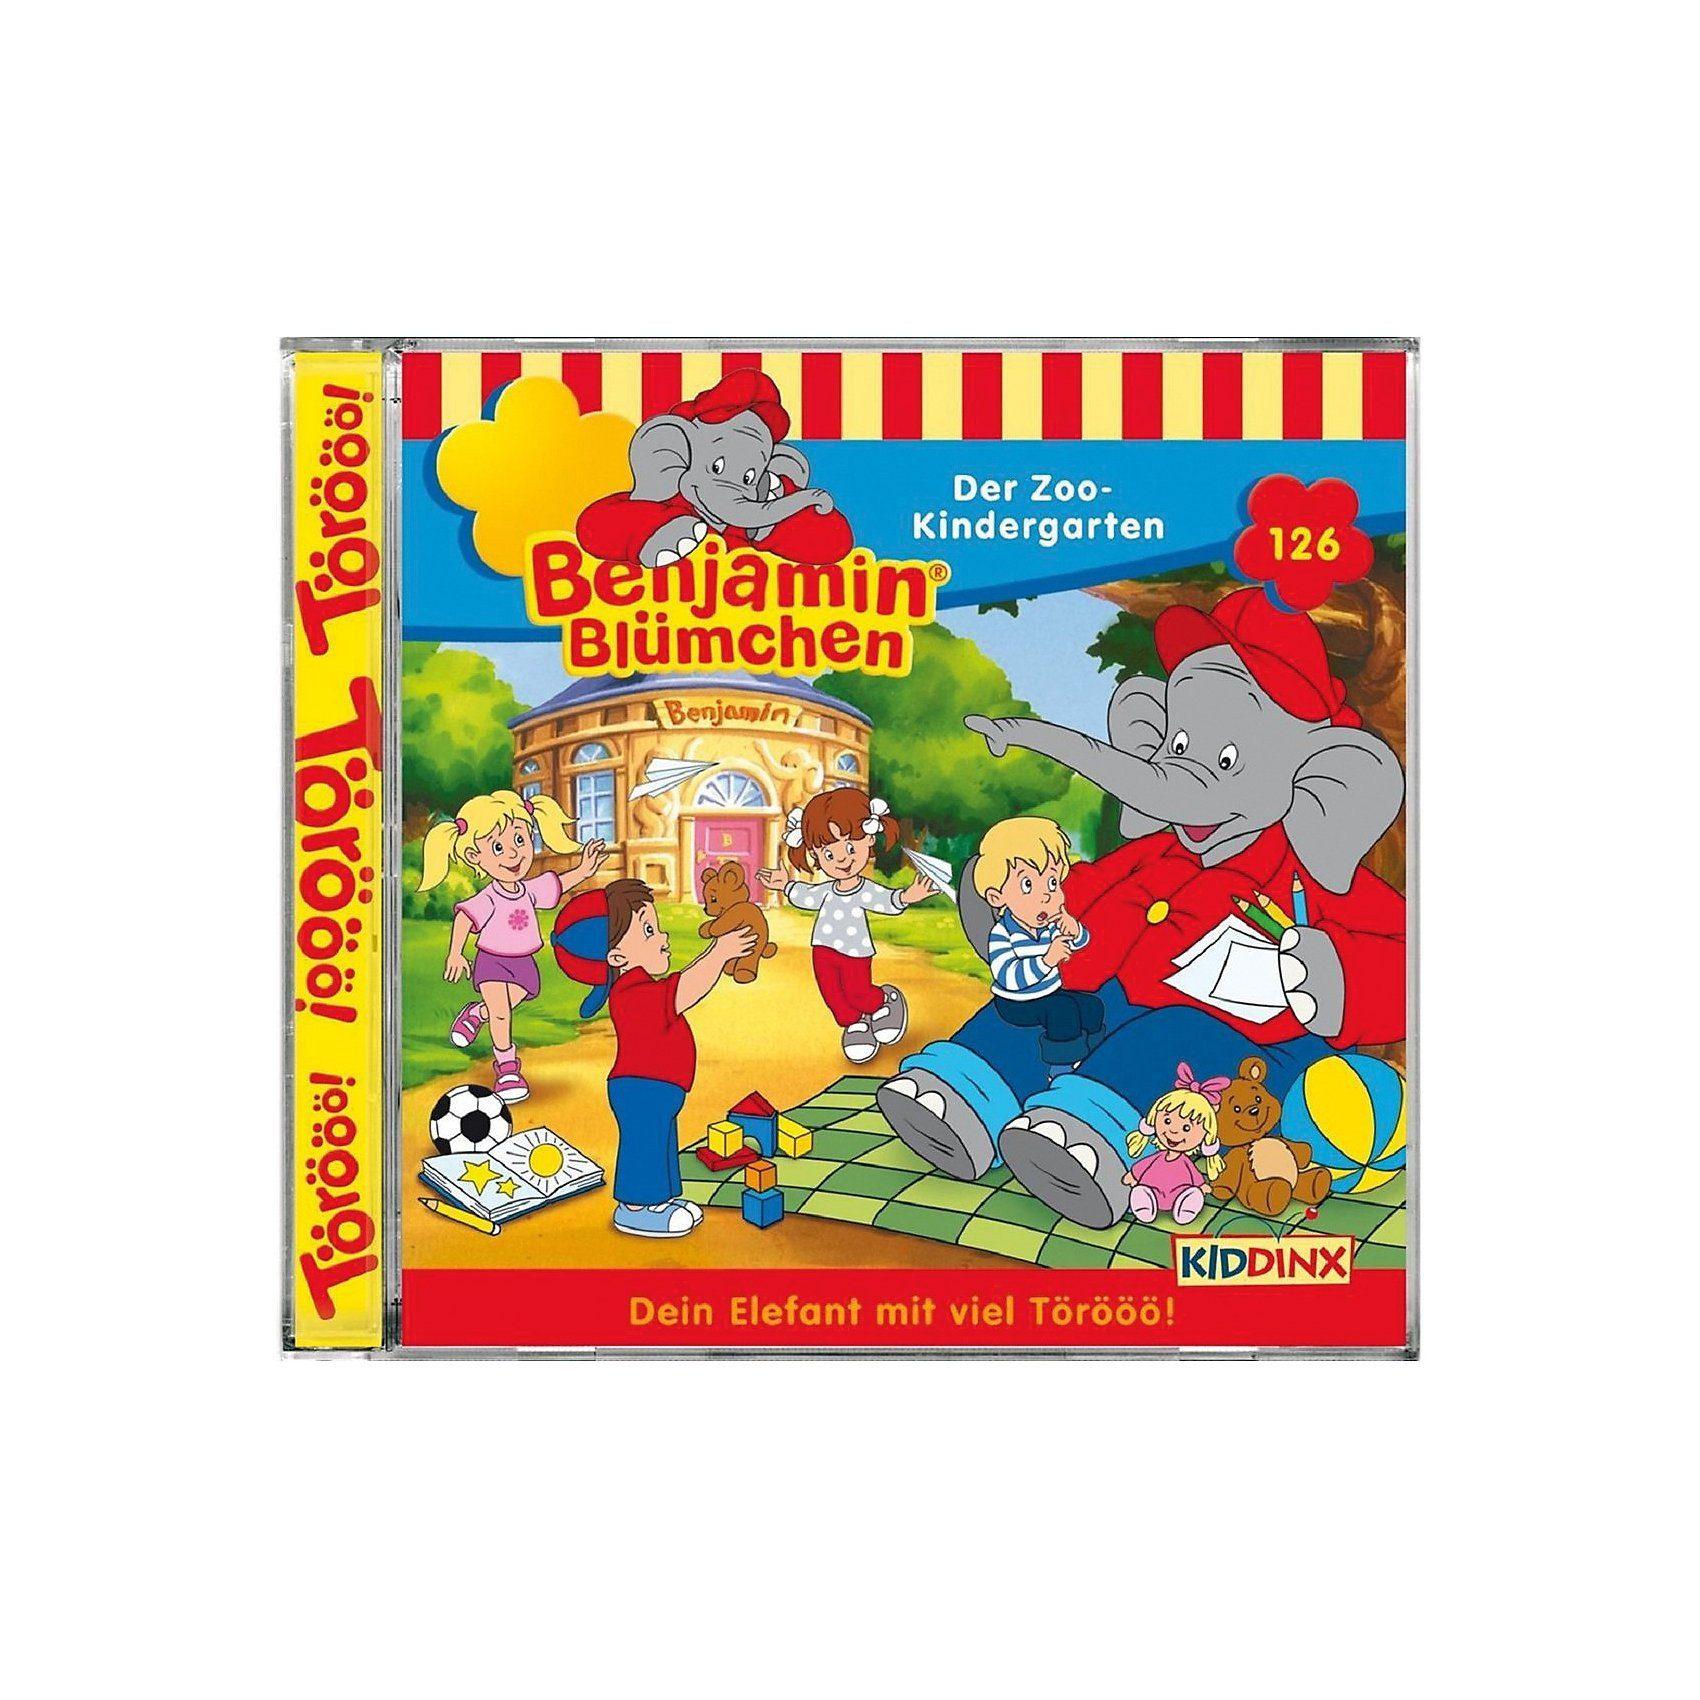 Kiddinx CD Benjamin Blümchen 126 - Der Zookindergarten